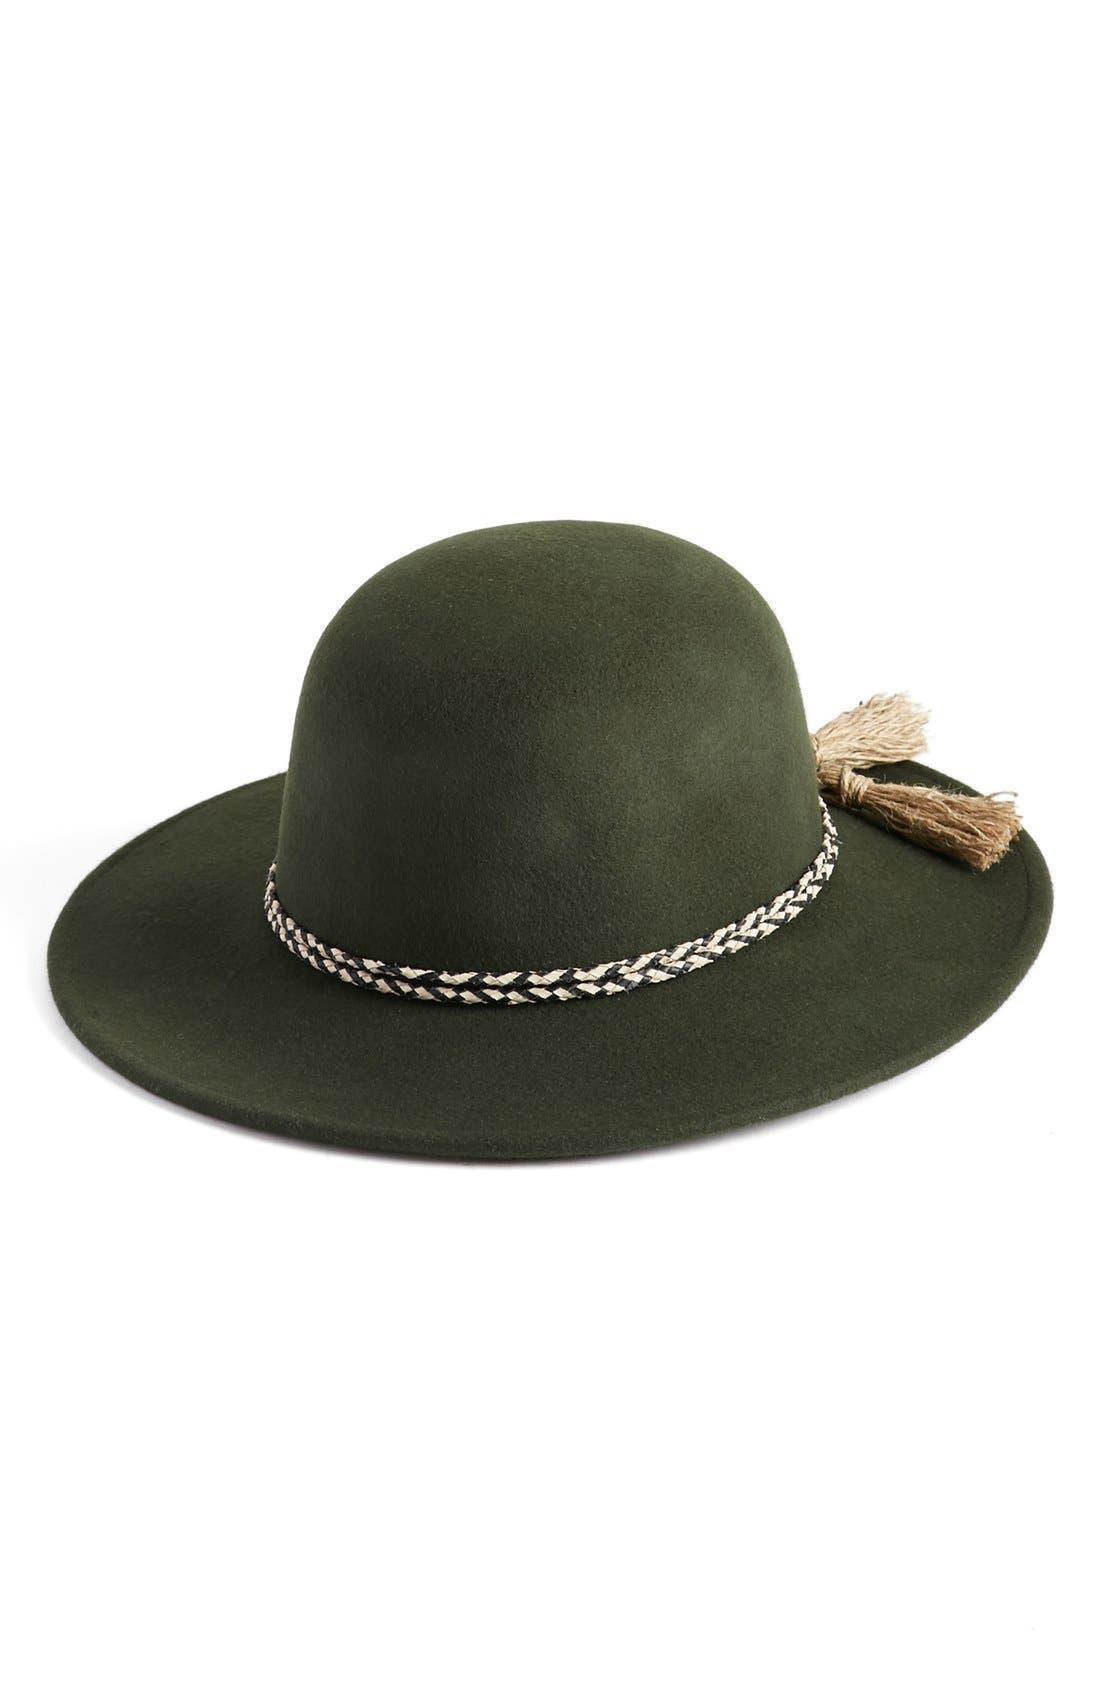 Main Image - Brixton 'Stills' Wool Hat